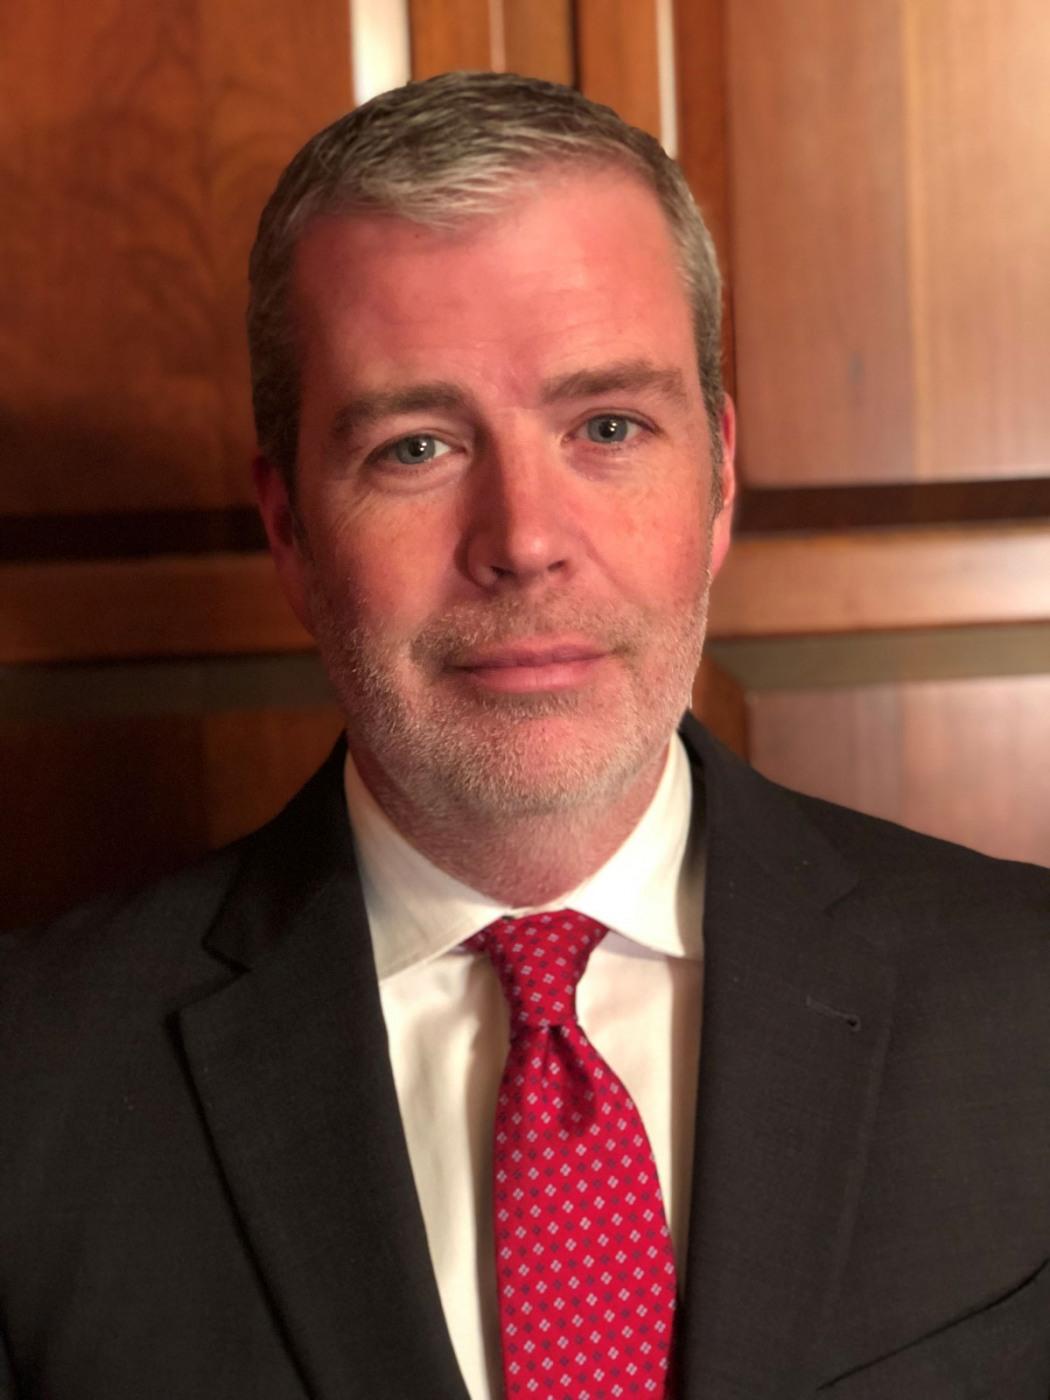 Michael P. White